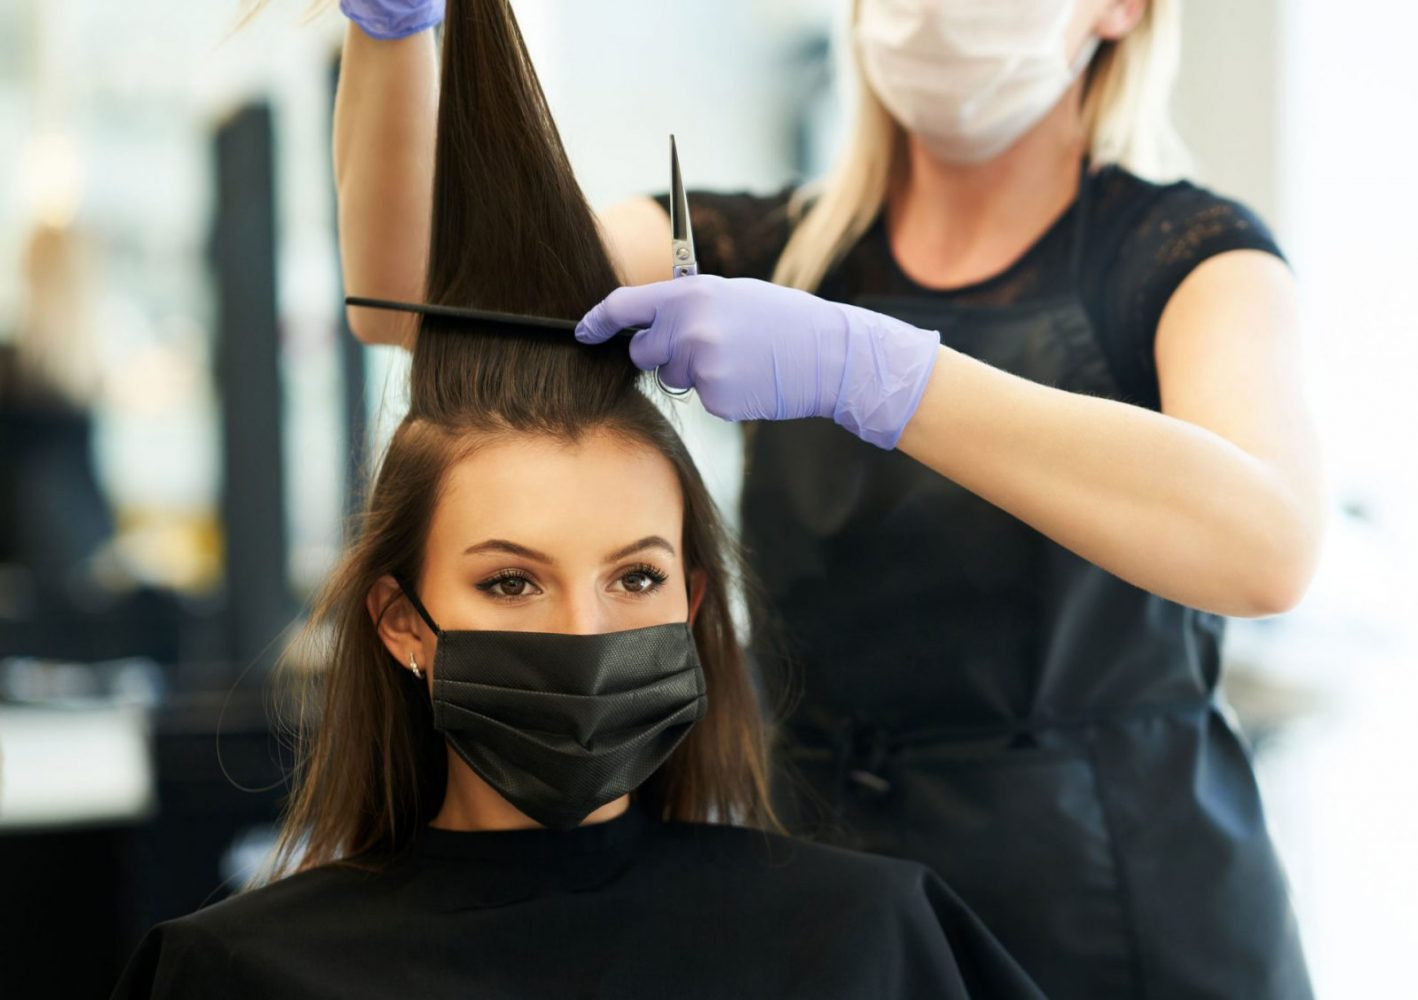 Hair salon sanitiser station